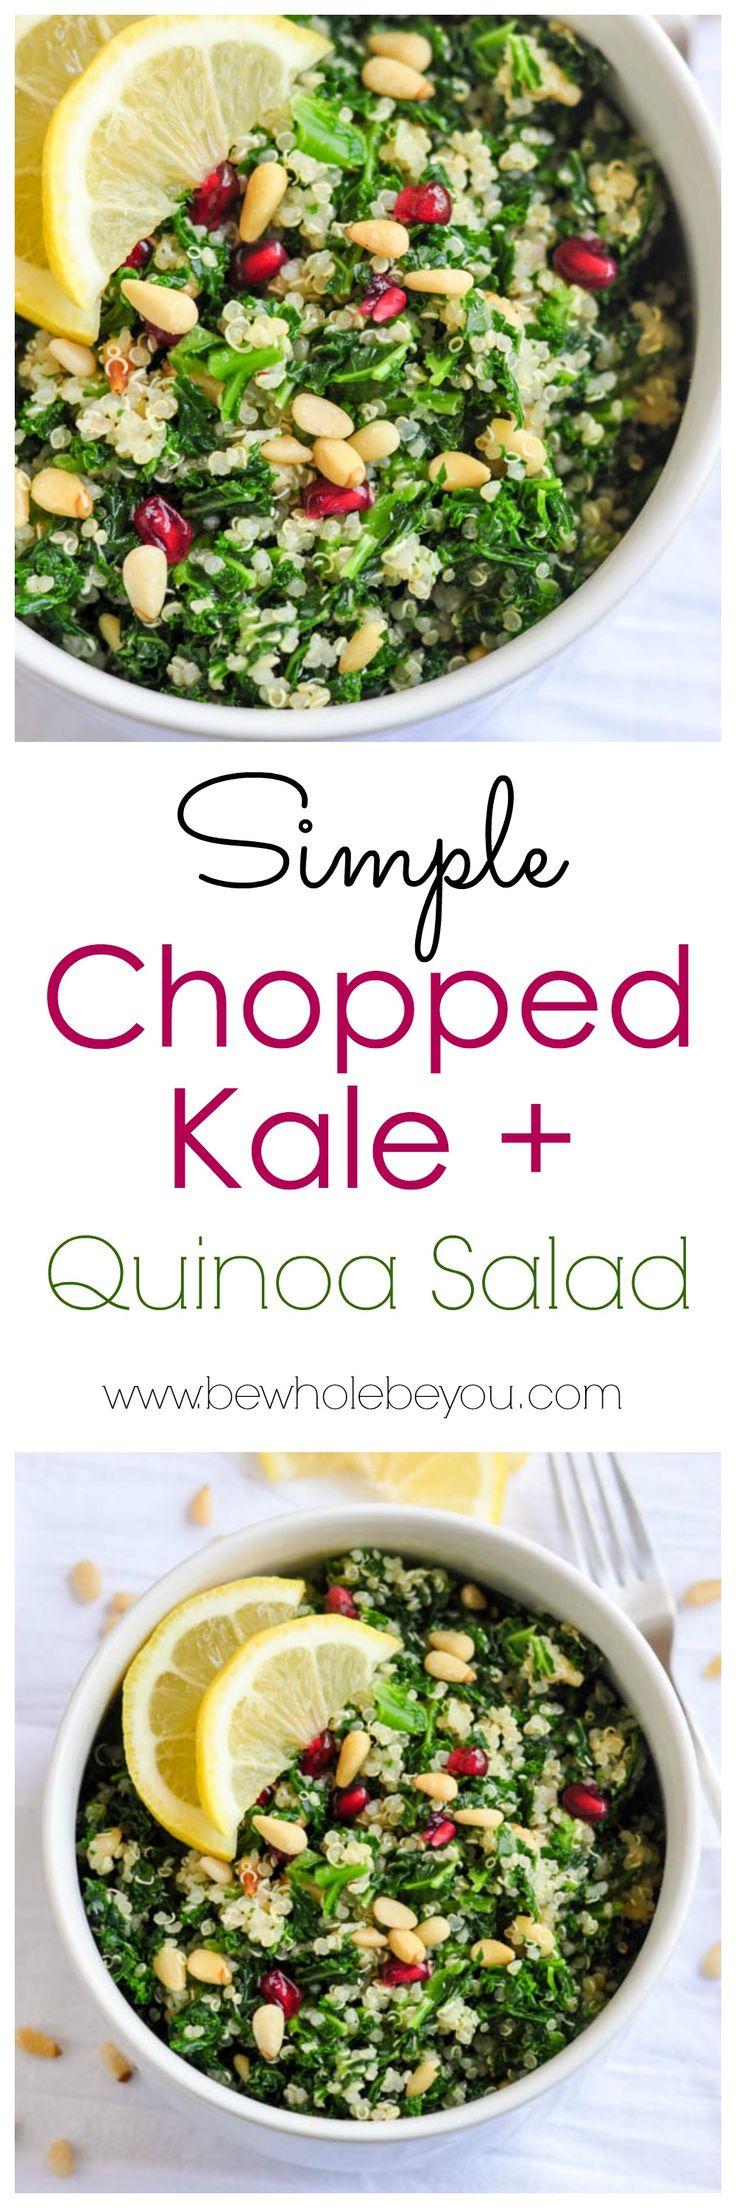 Simple Chopped Kale   Quinoa Salad. Be Whole Be You.